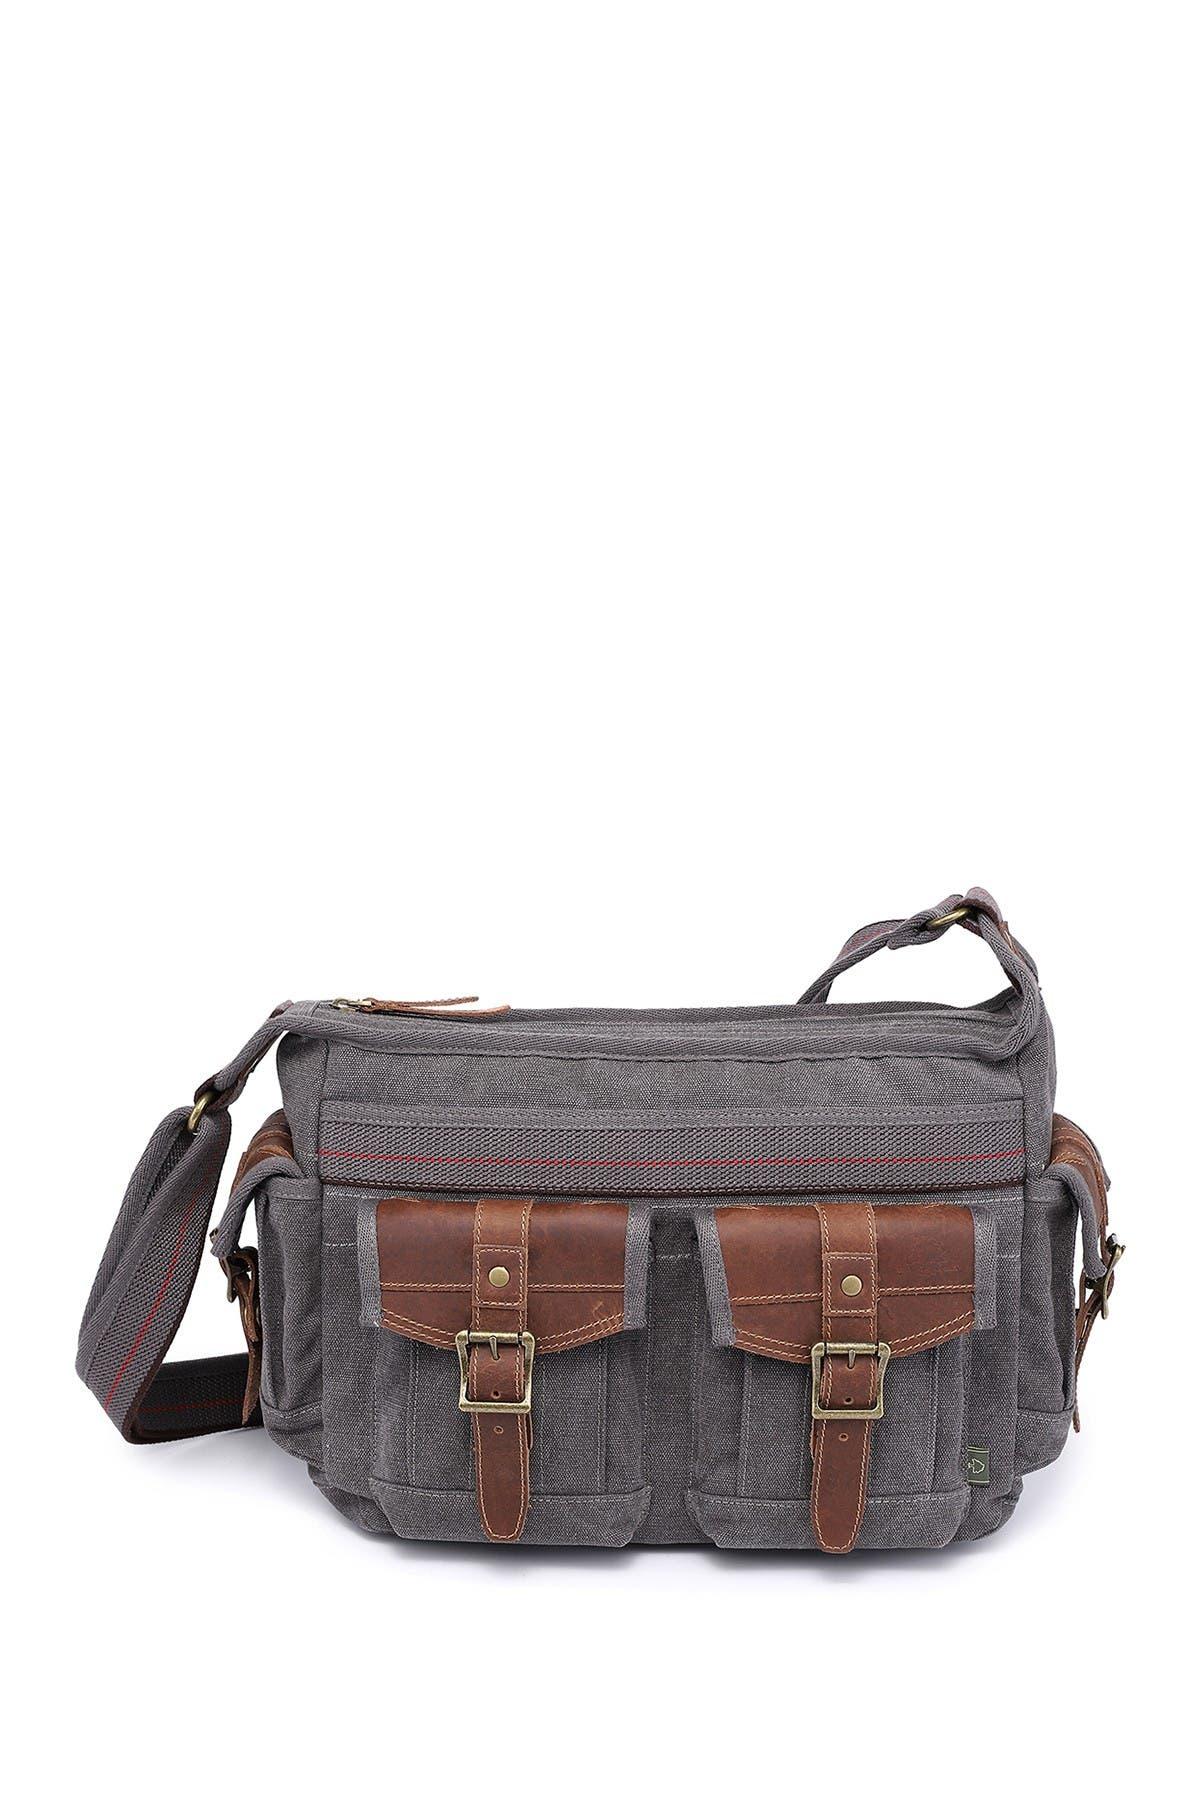 Image of TSD Turtle Ridge Canvas Mail Bag